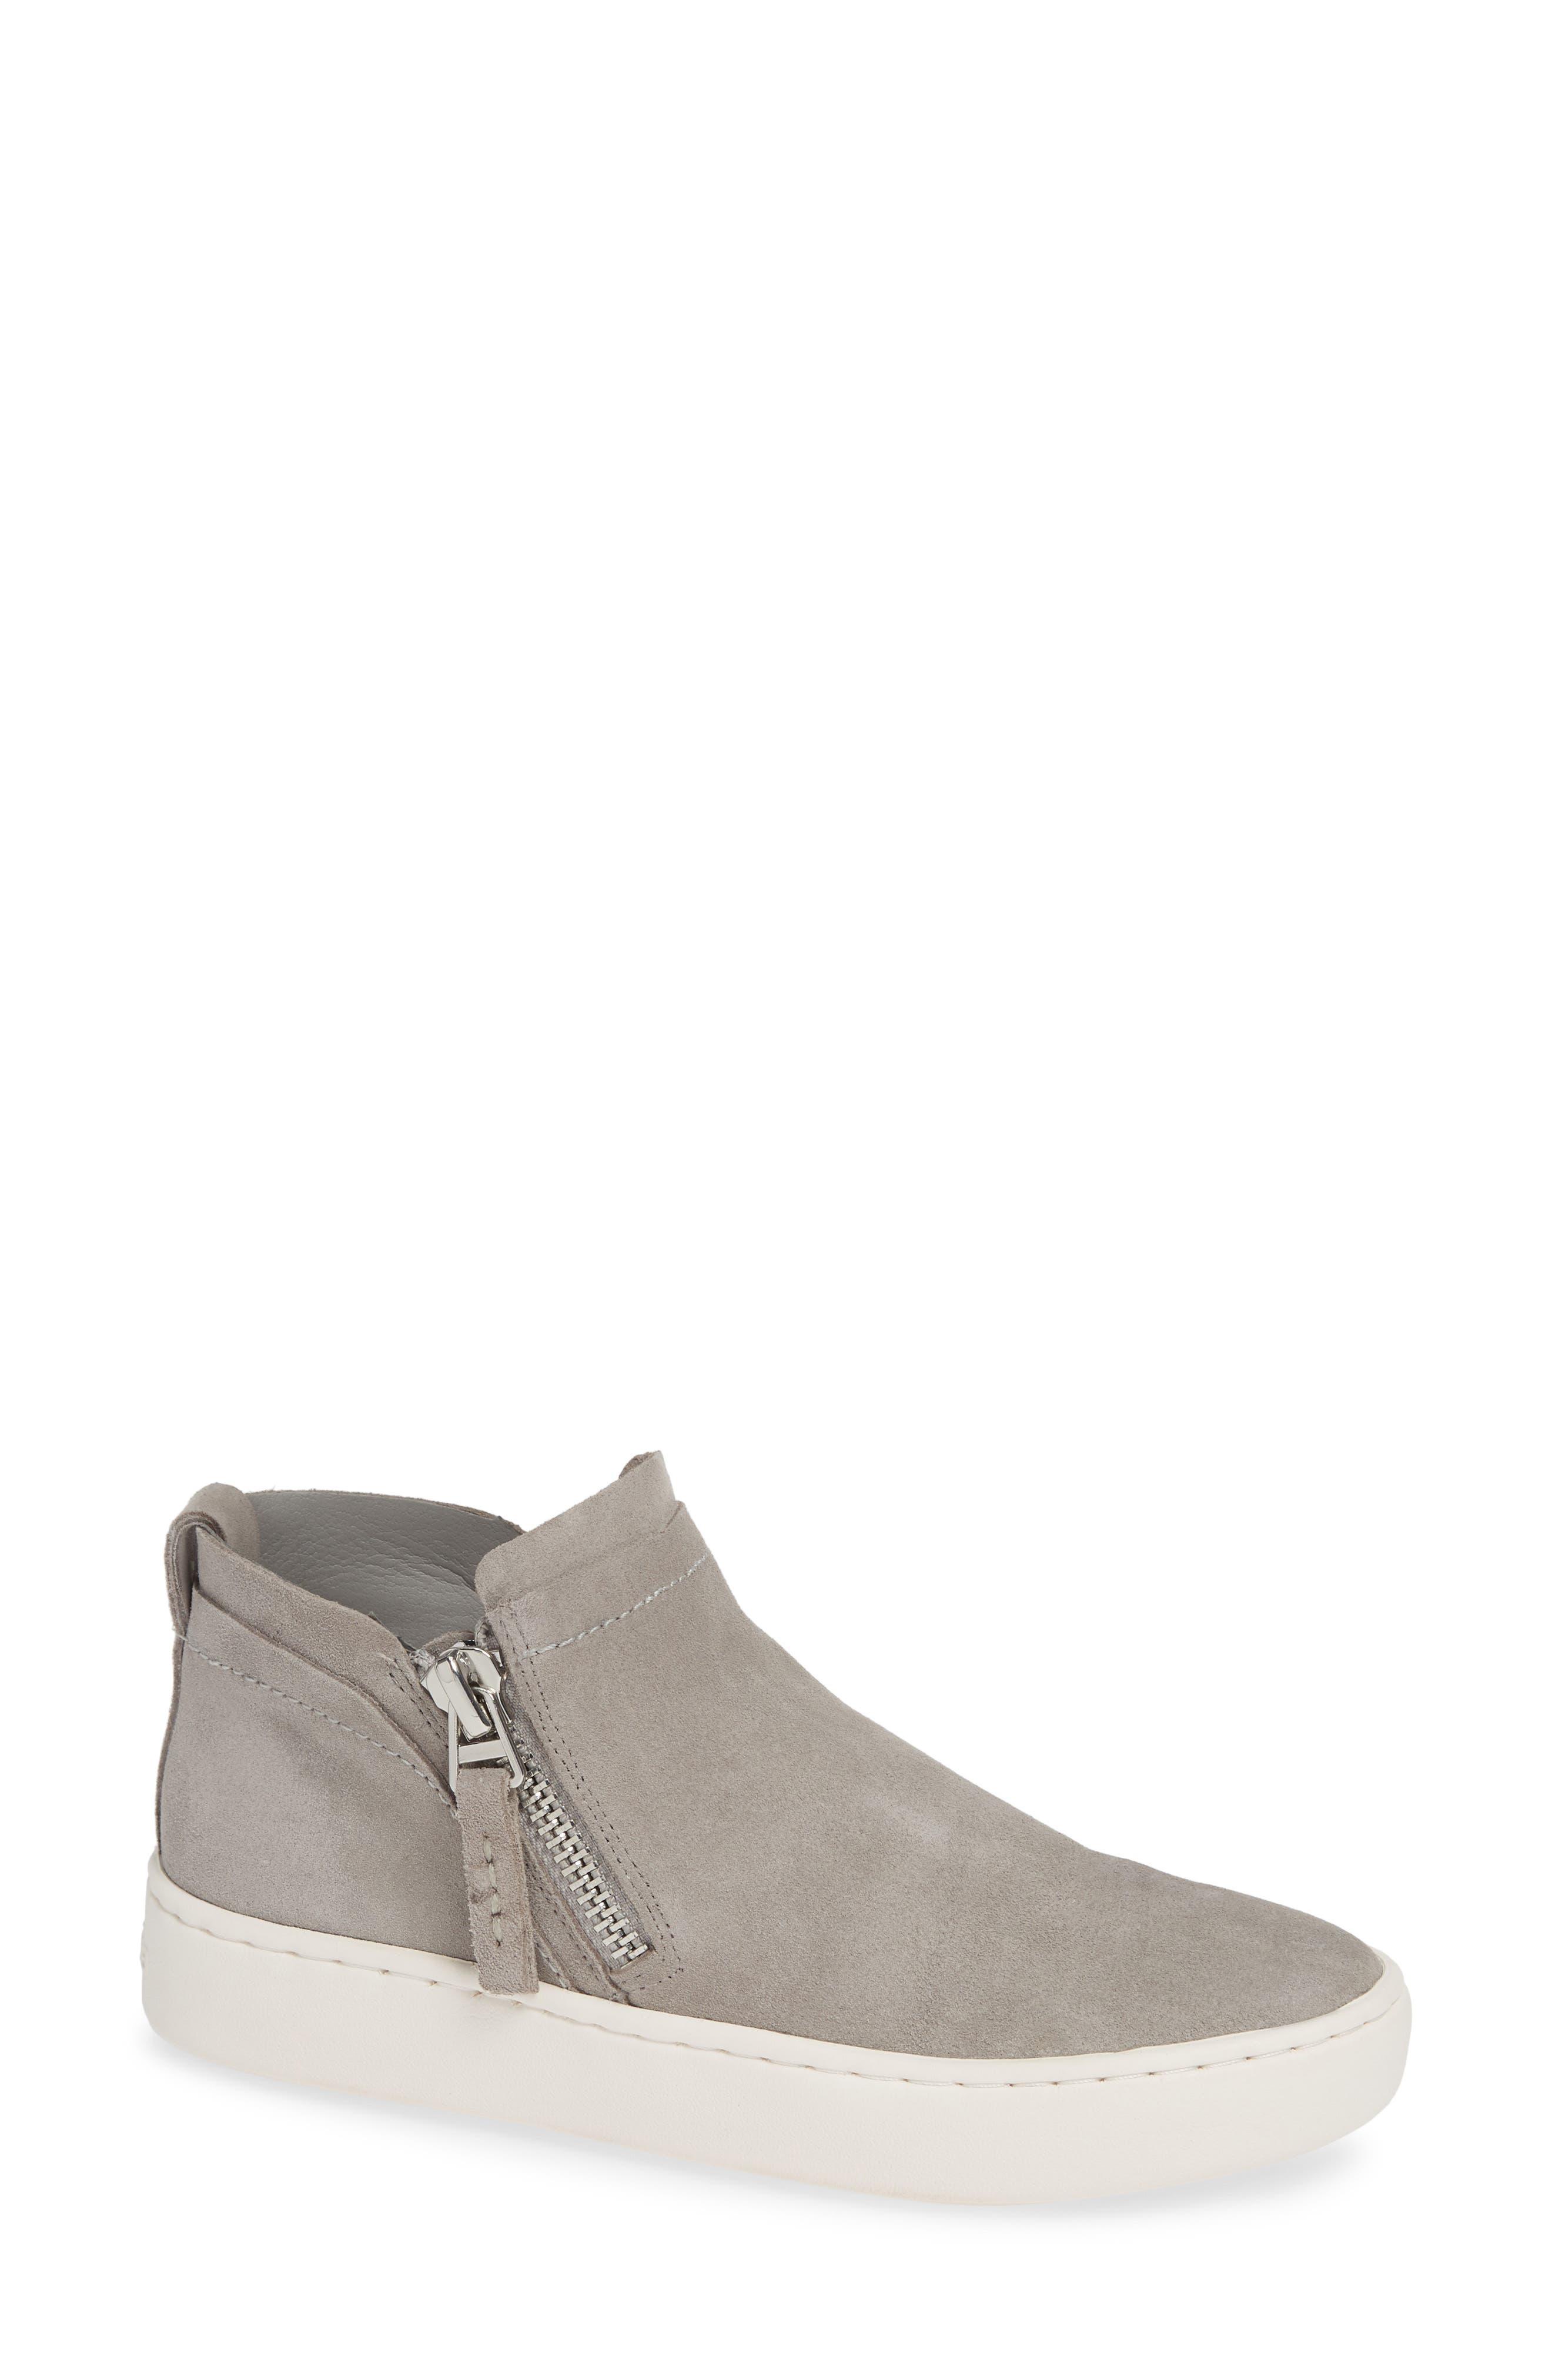 DOLCE VITA, Tobee Zip Sneaker, Main thumbnail 1, color, SMOKE SUEDE